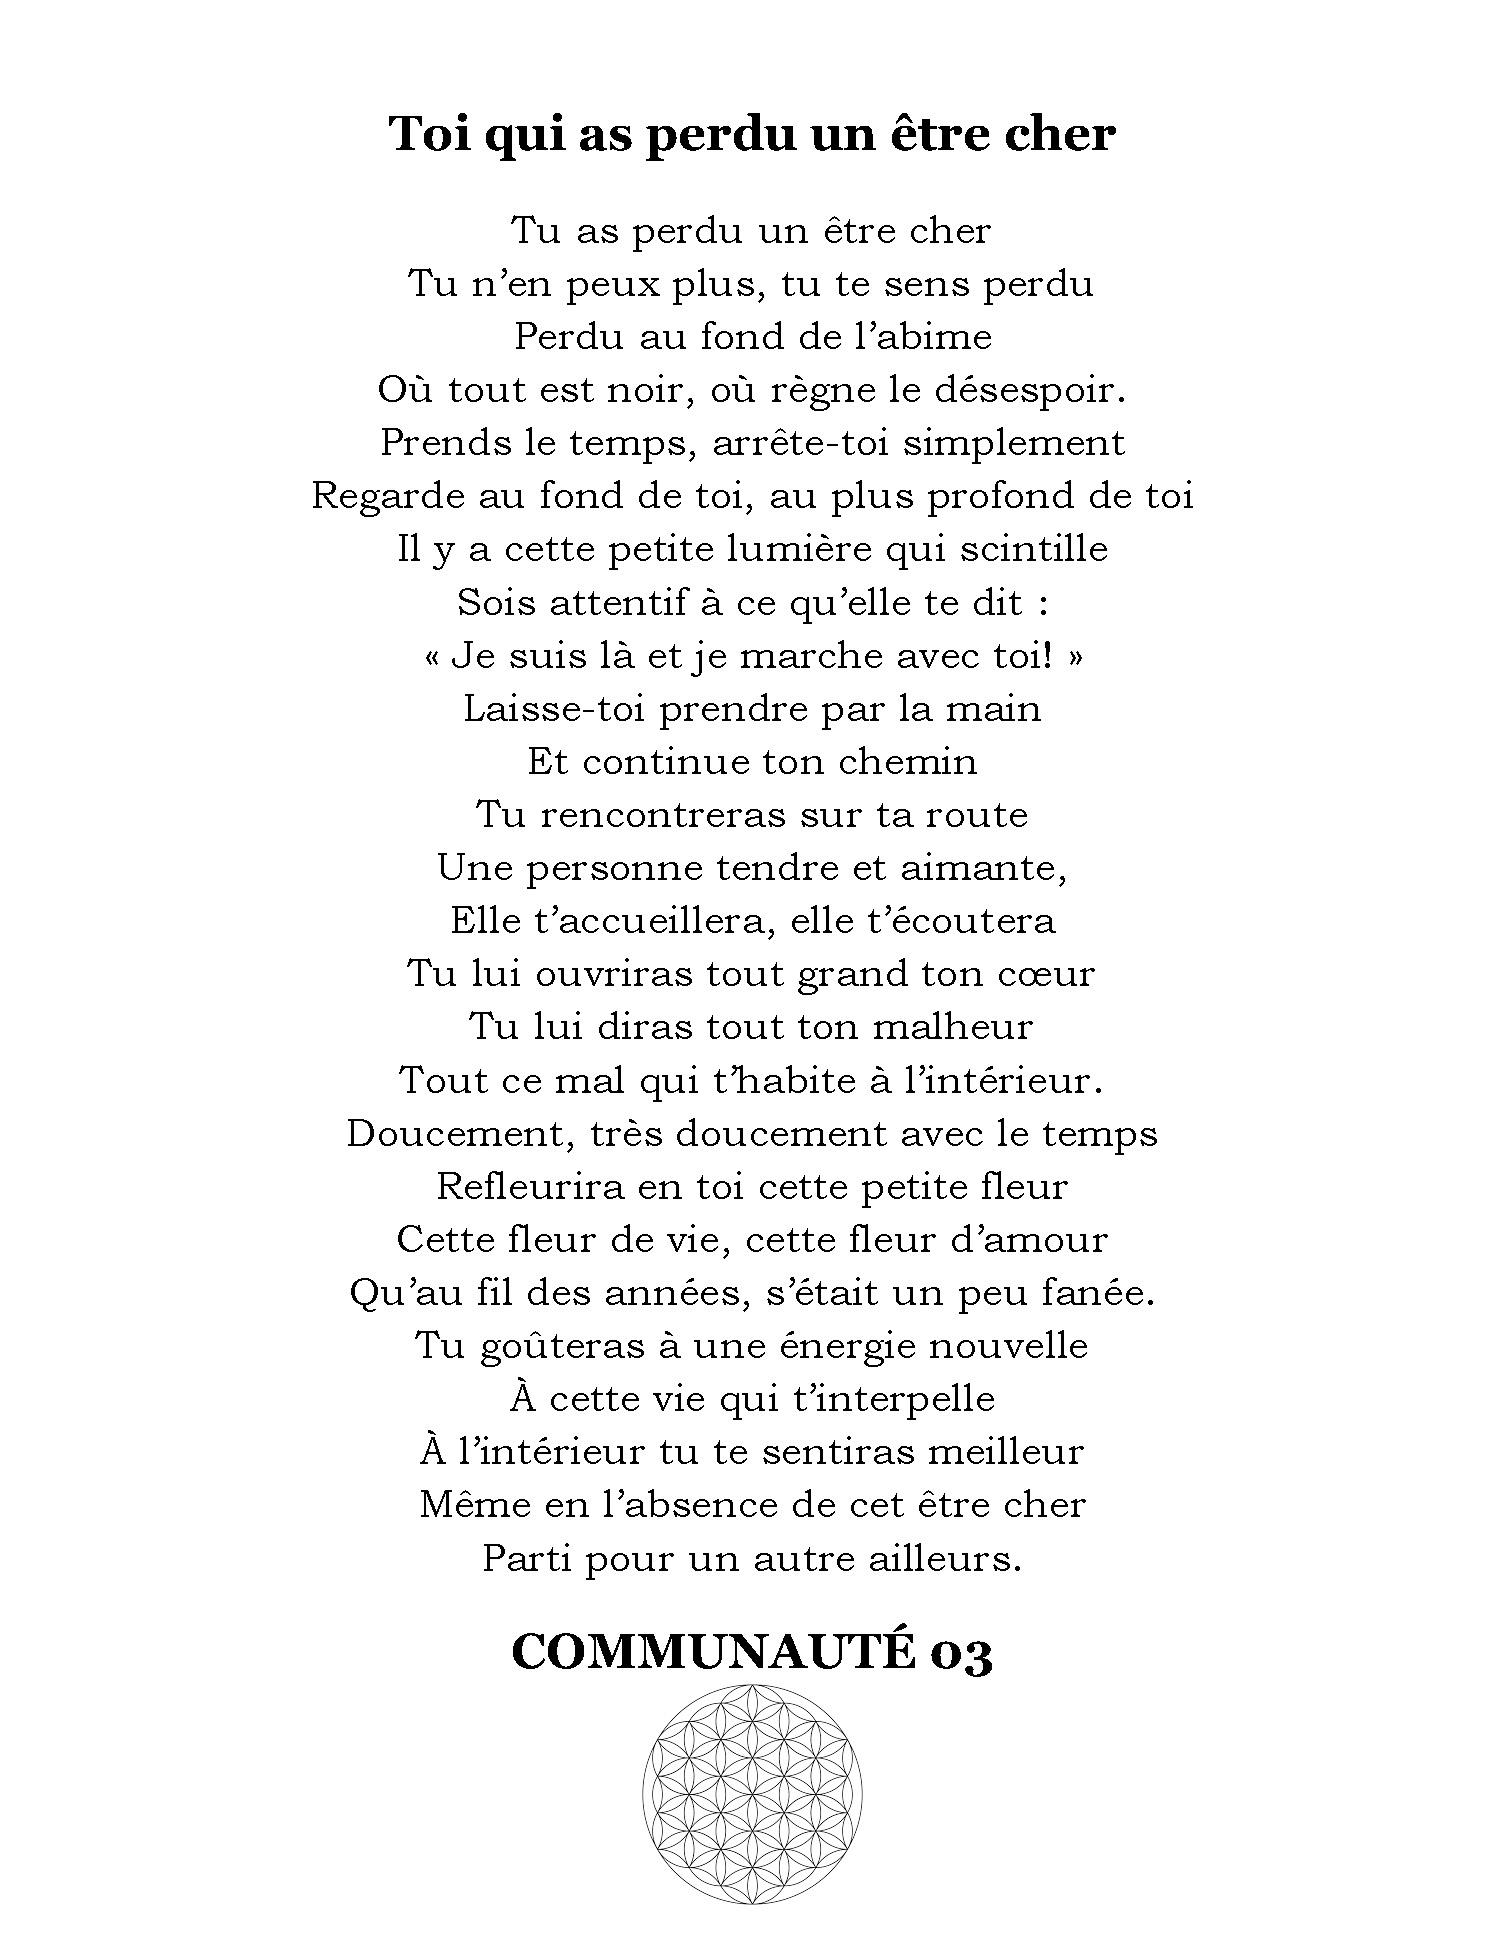 Communauté 03